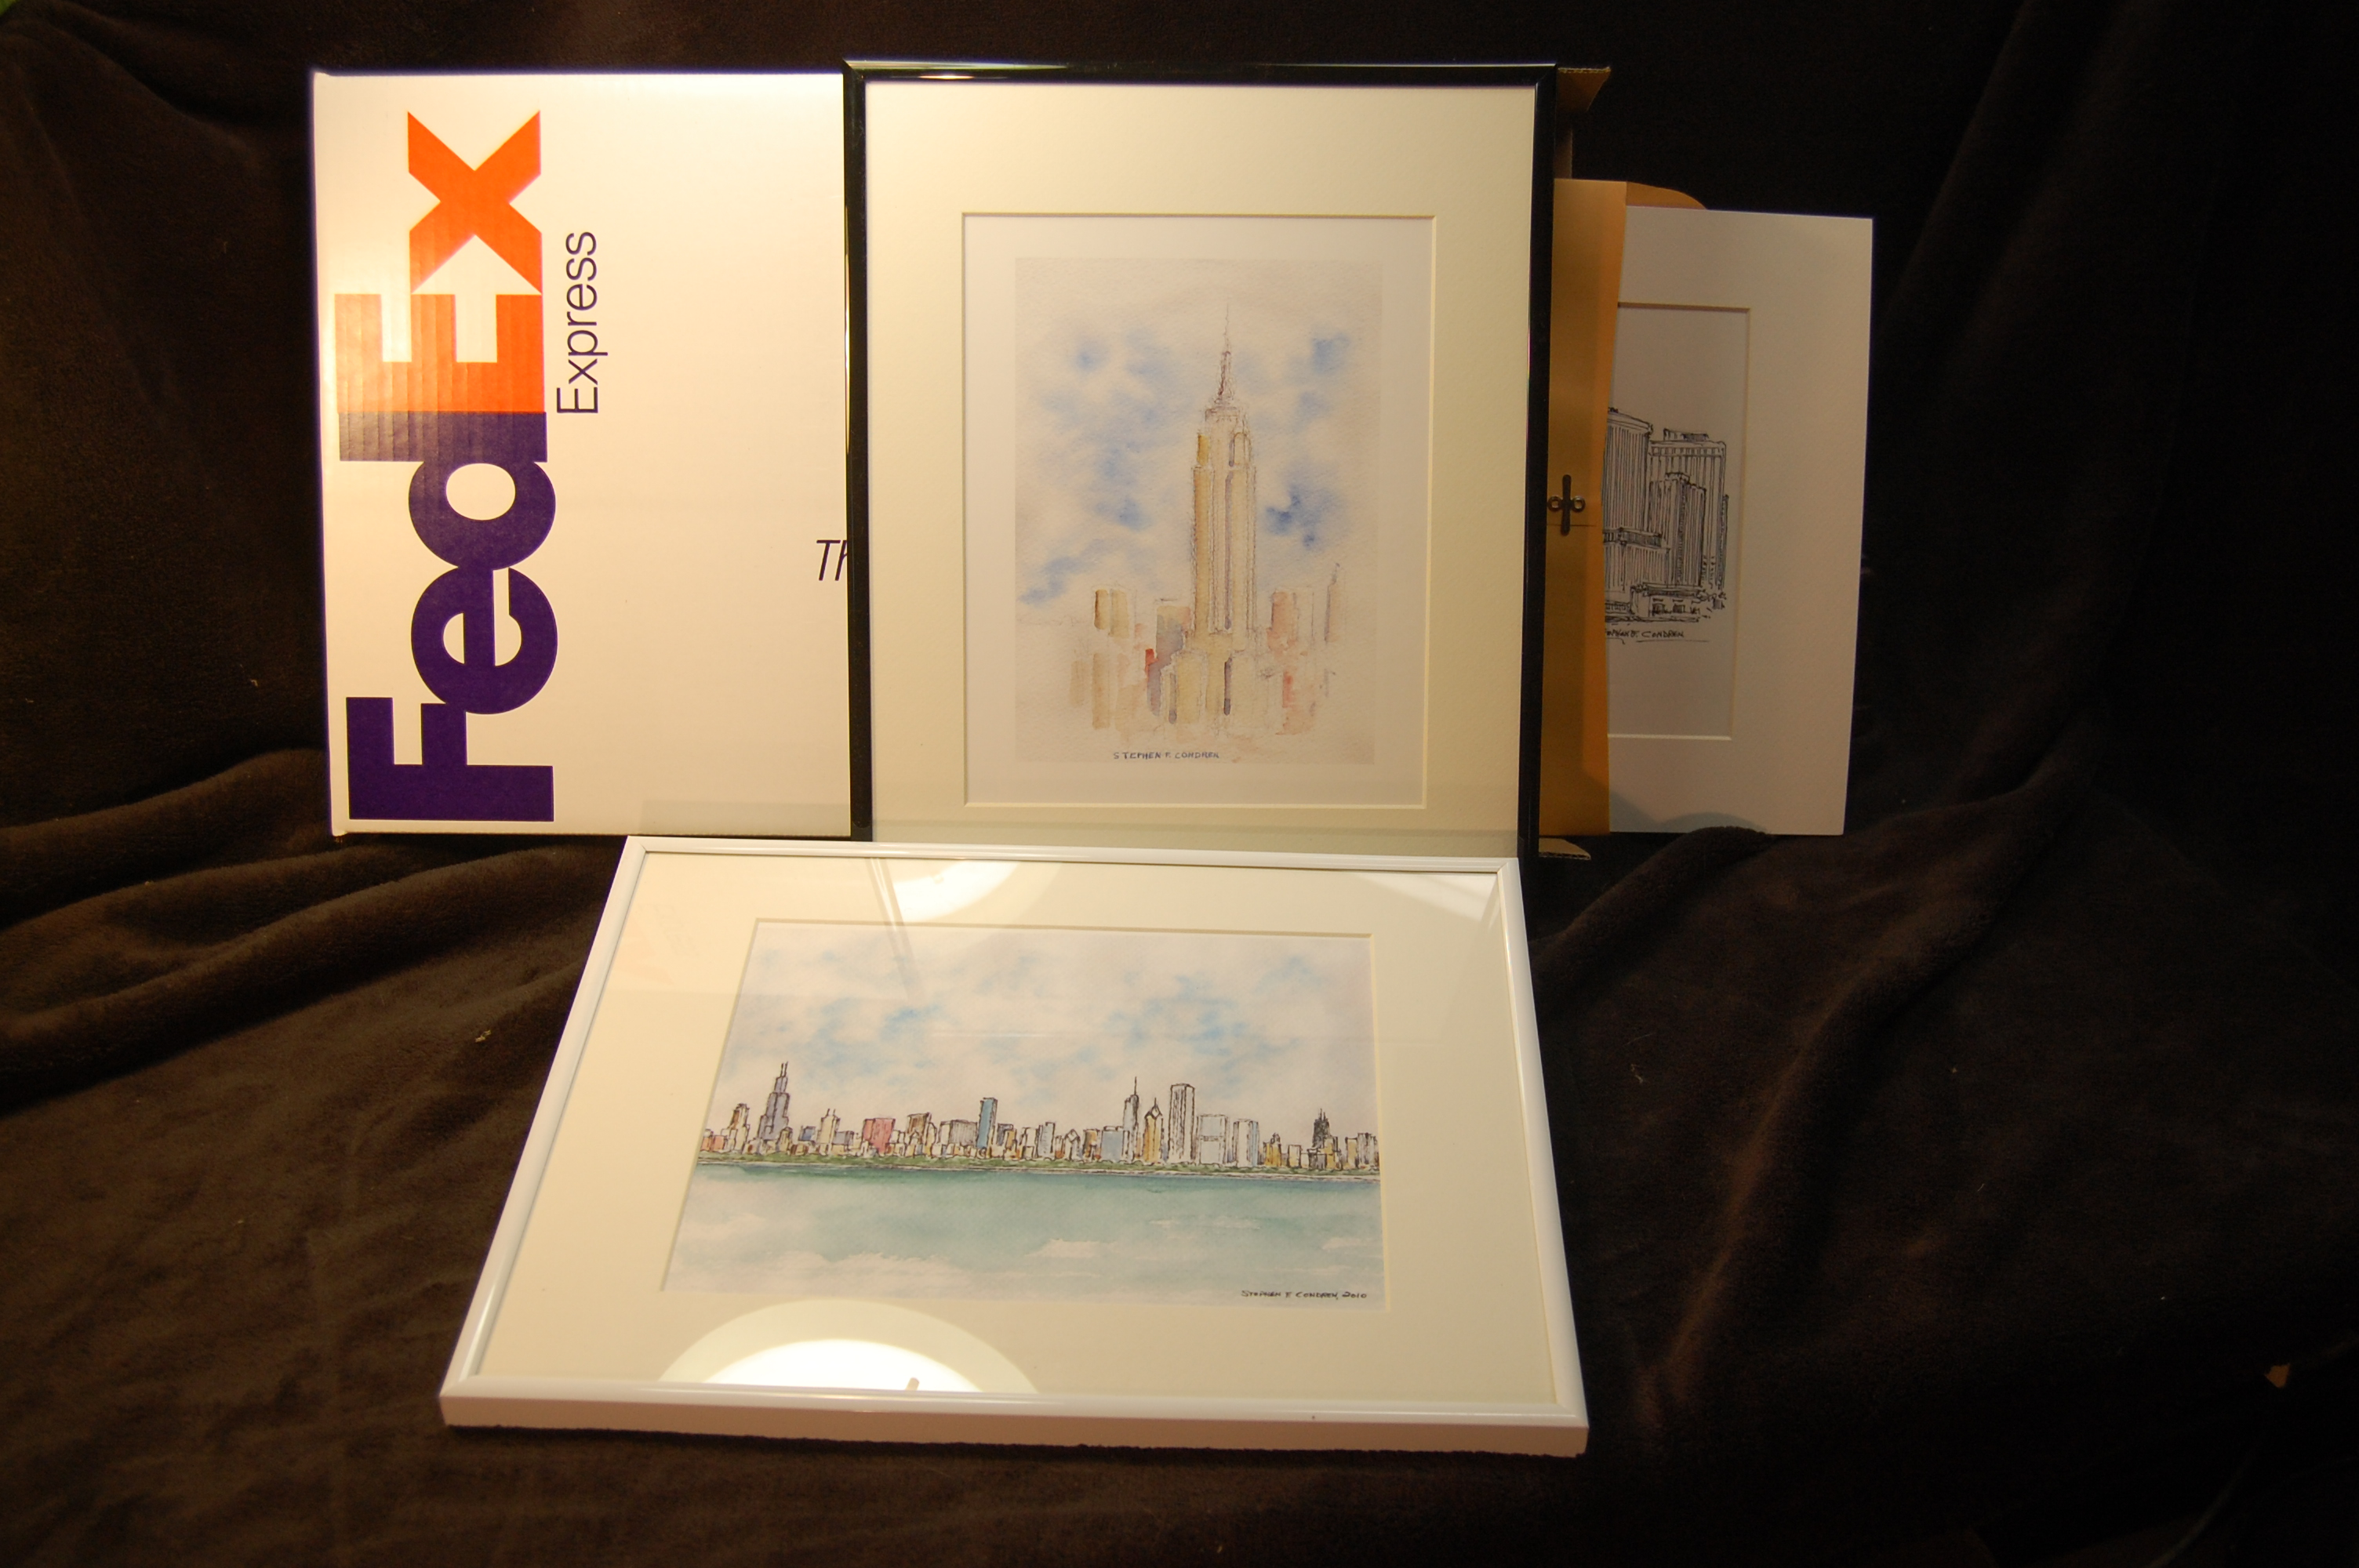 Framed original skyline art by artist Stephen F. Condren.